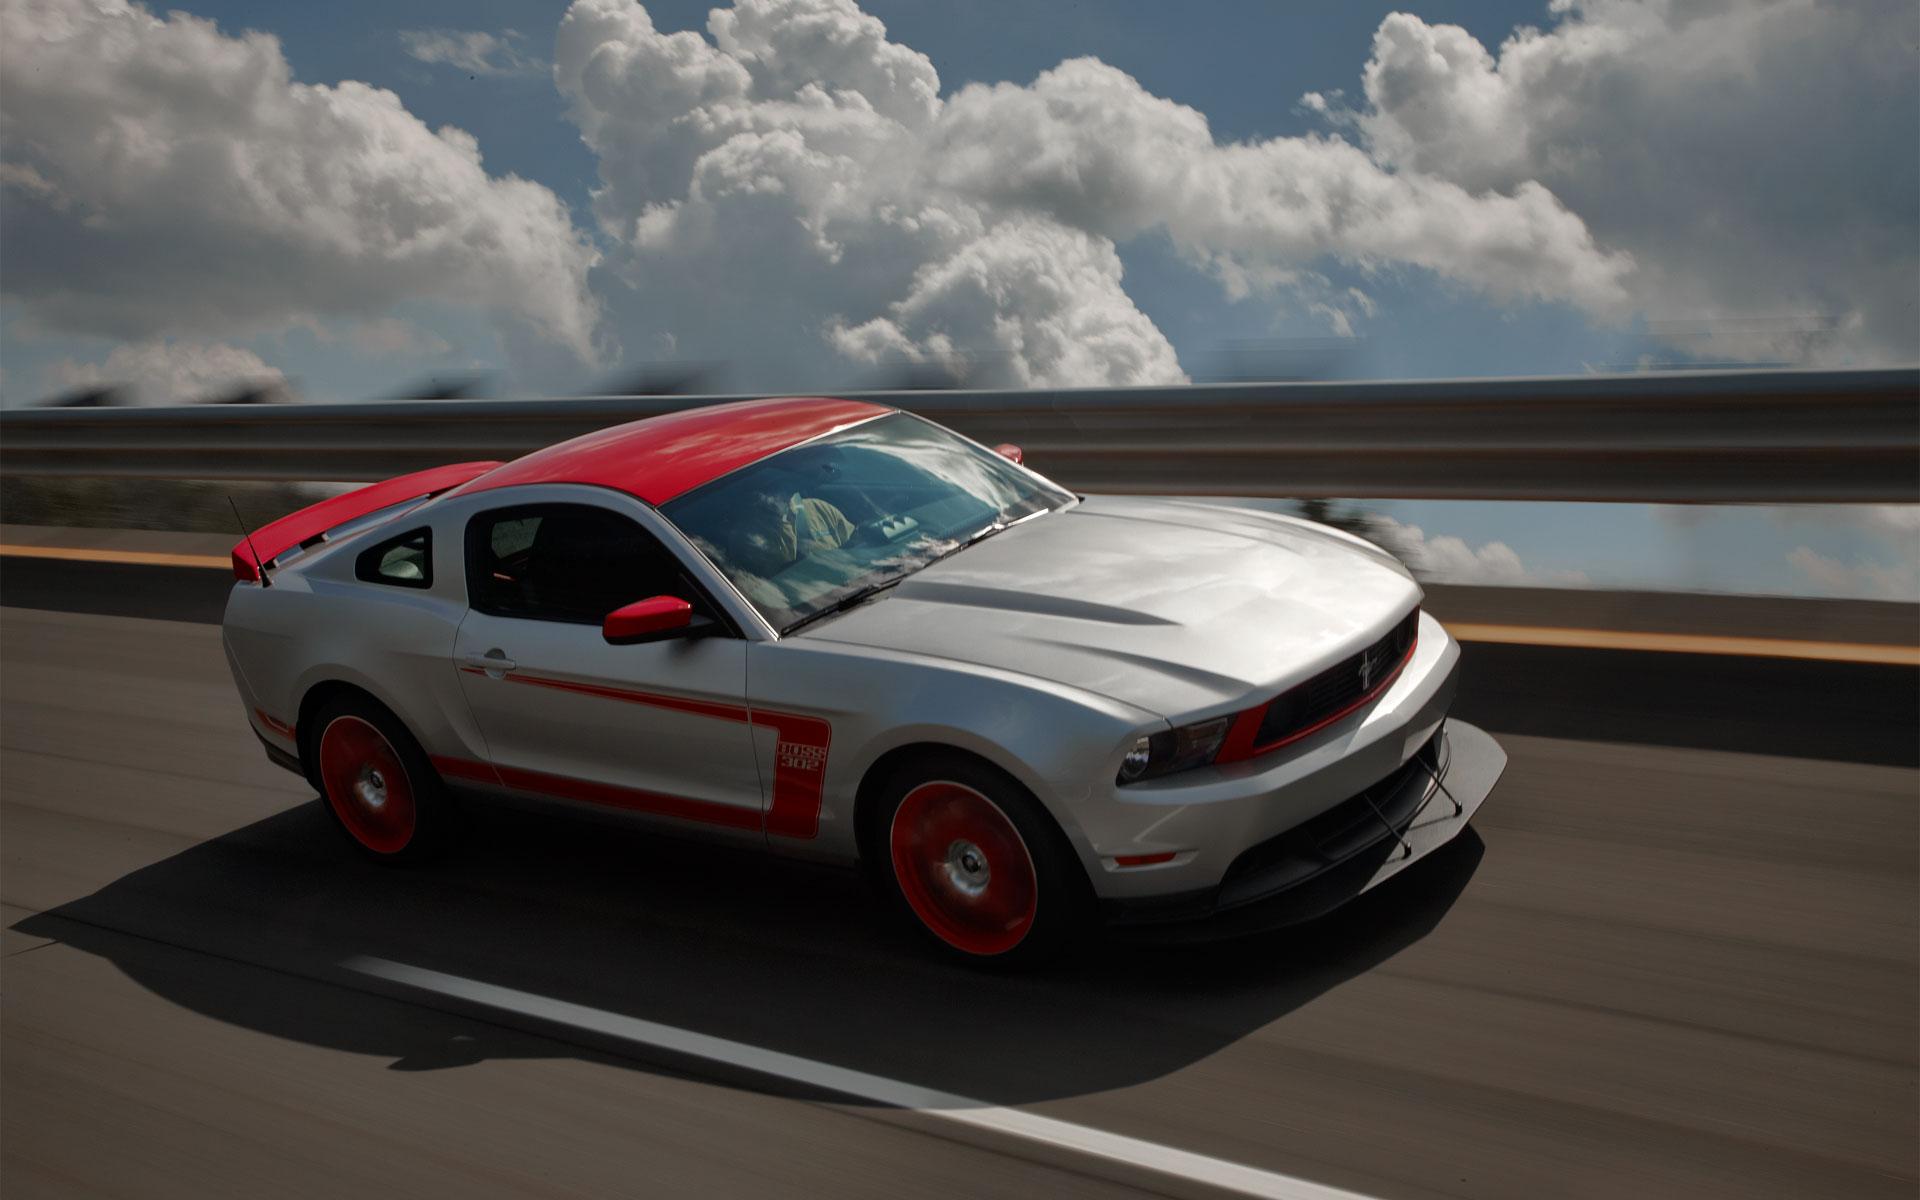 Top gear muscle cars episode released feb 21 2012 iakobou ford mustang boss 302 publicscrutiny Gallery